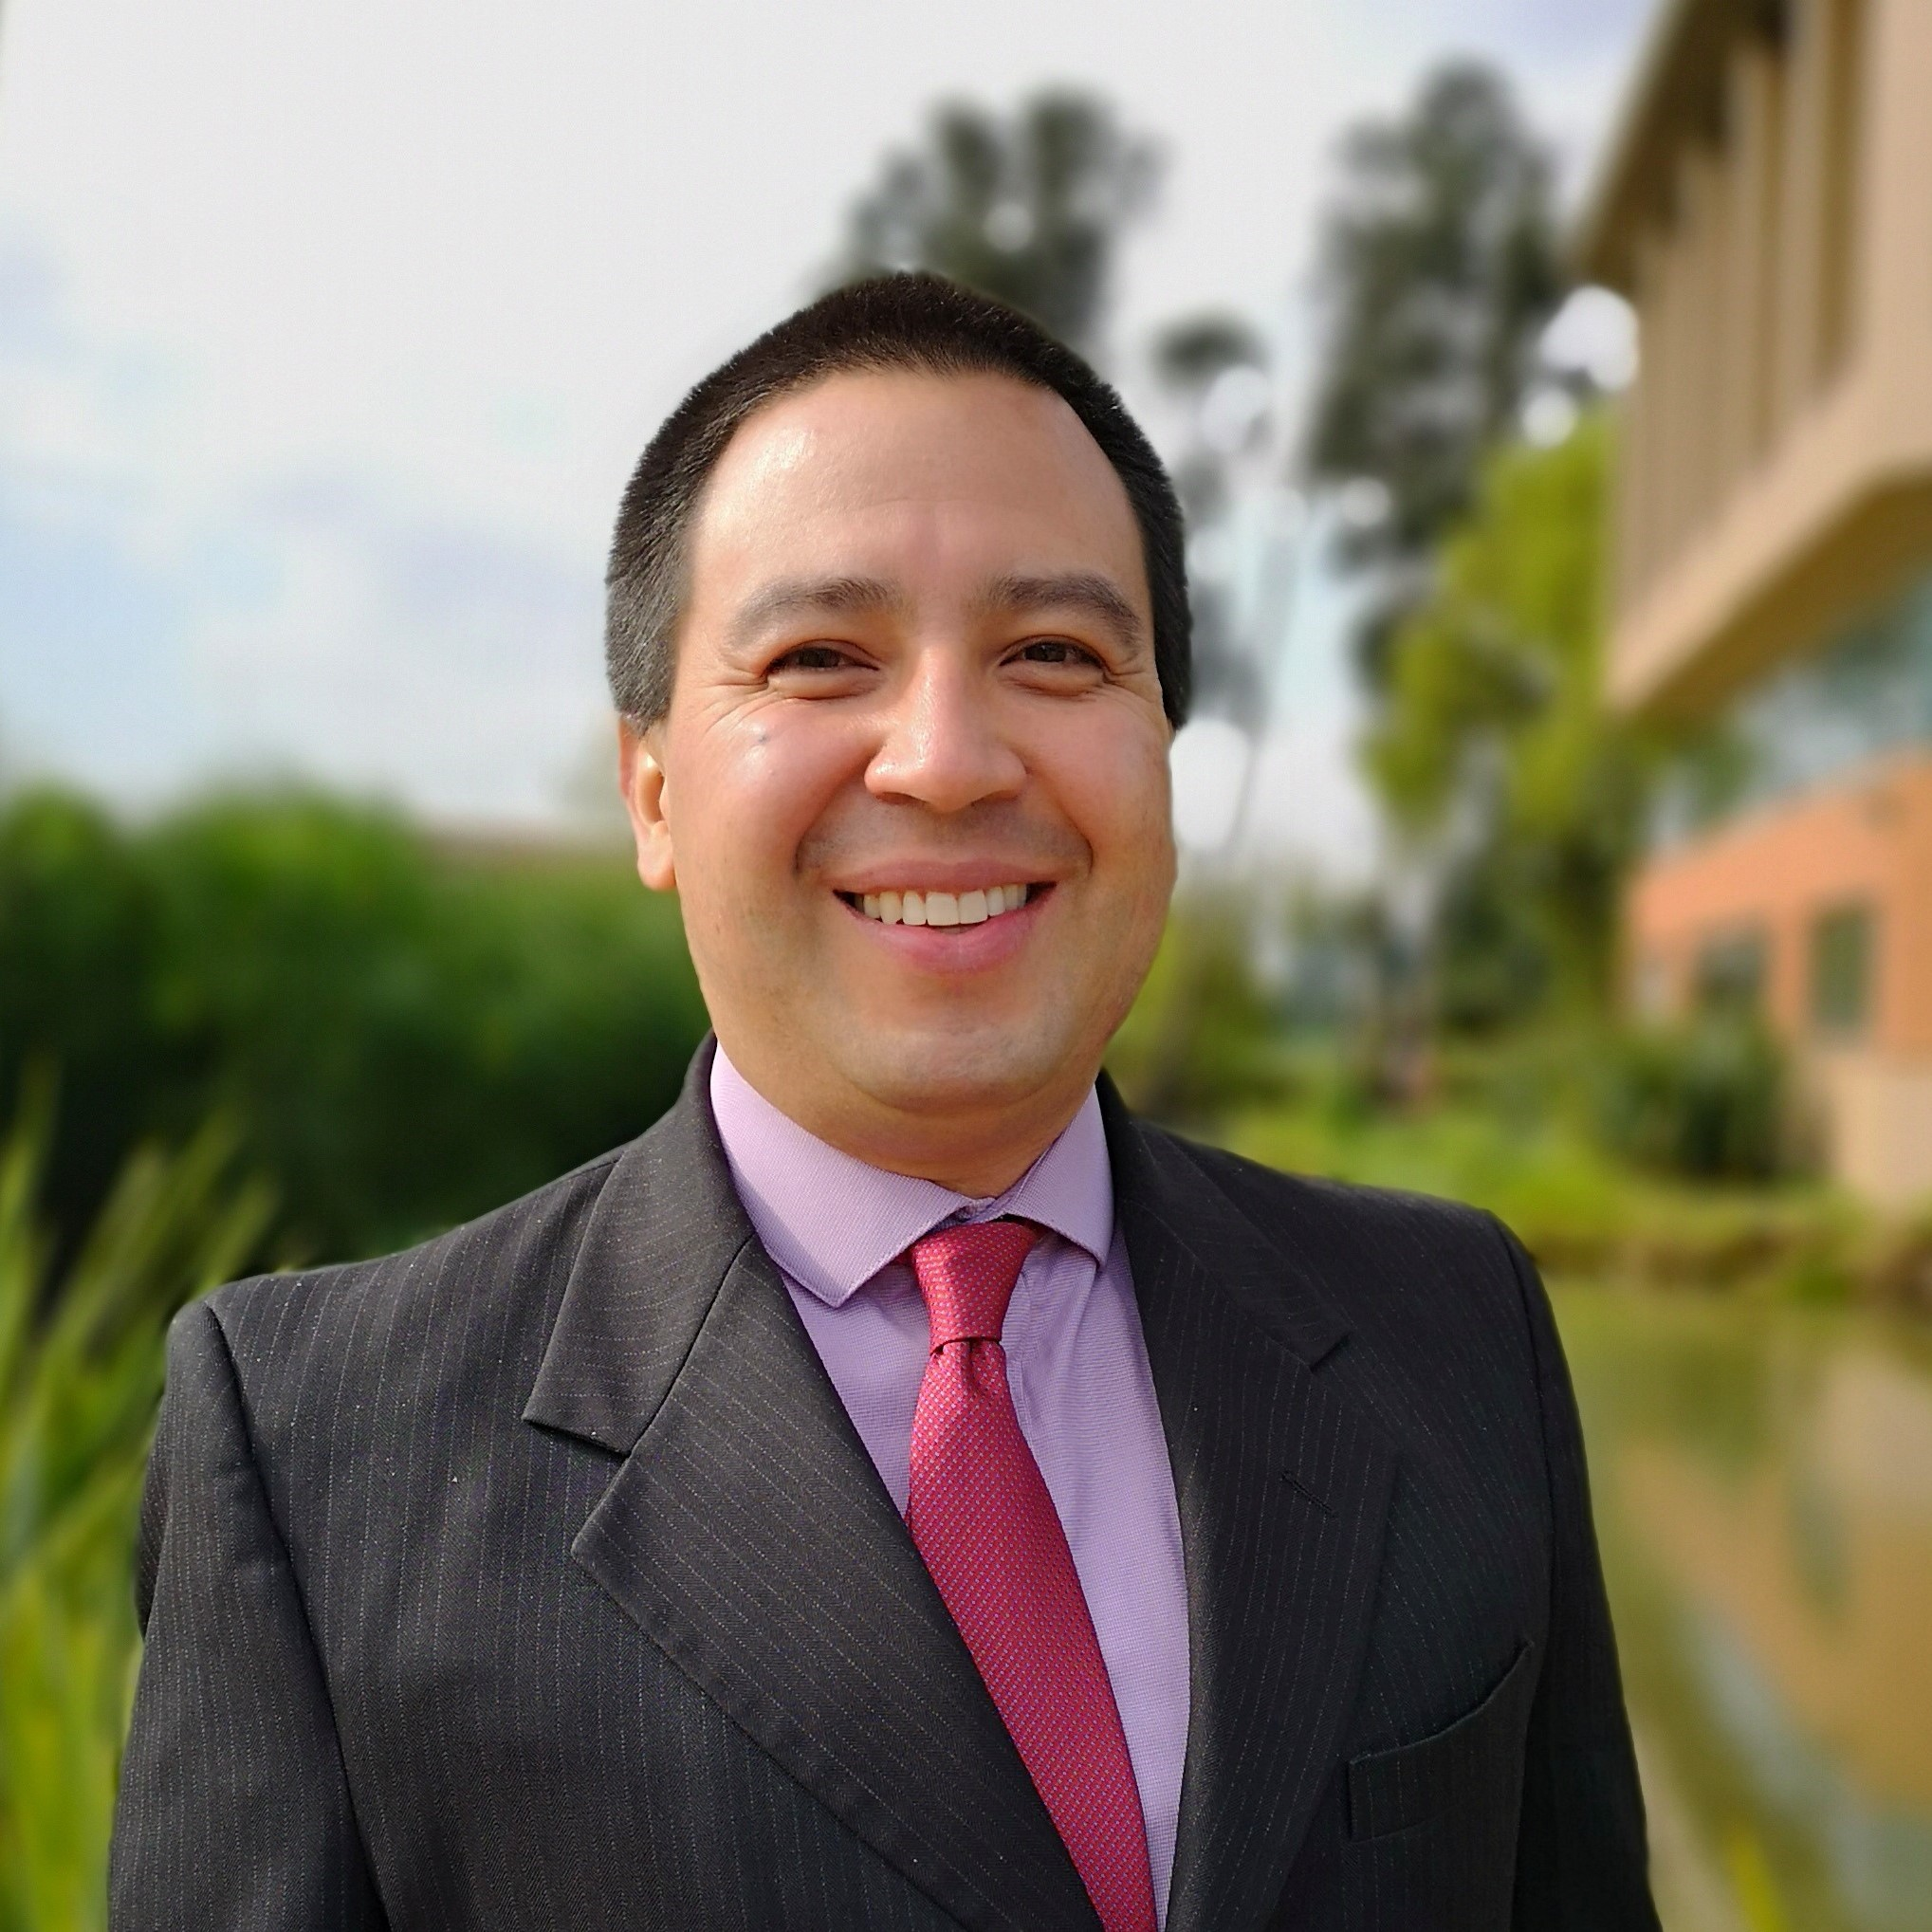 Carlos Barreto Tovar